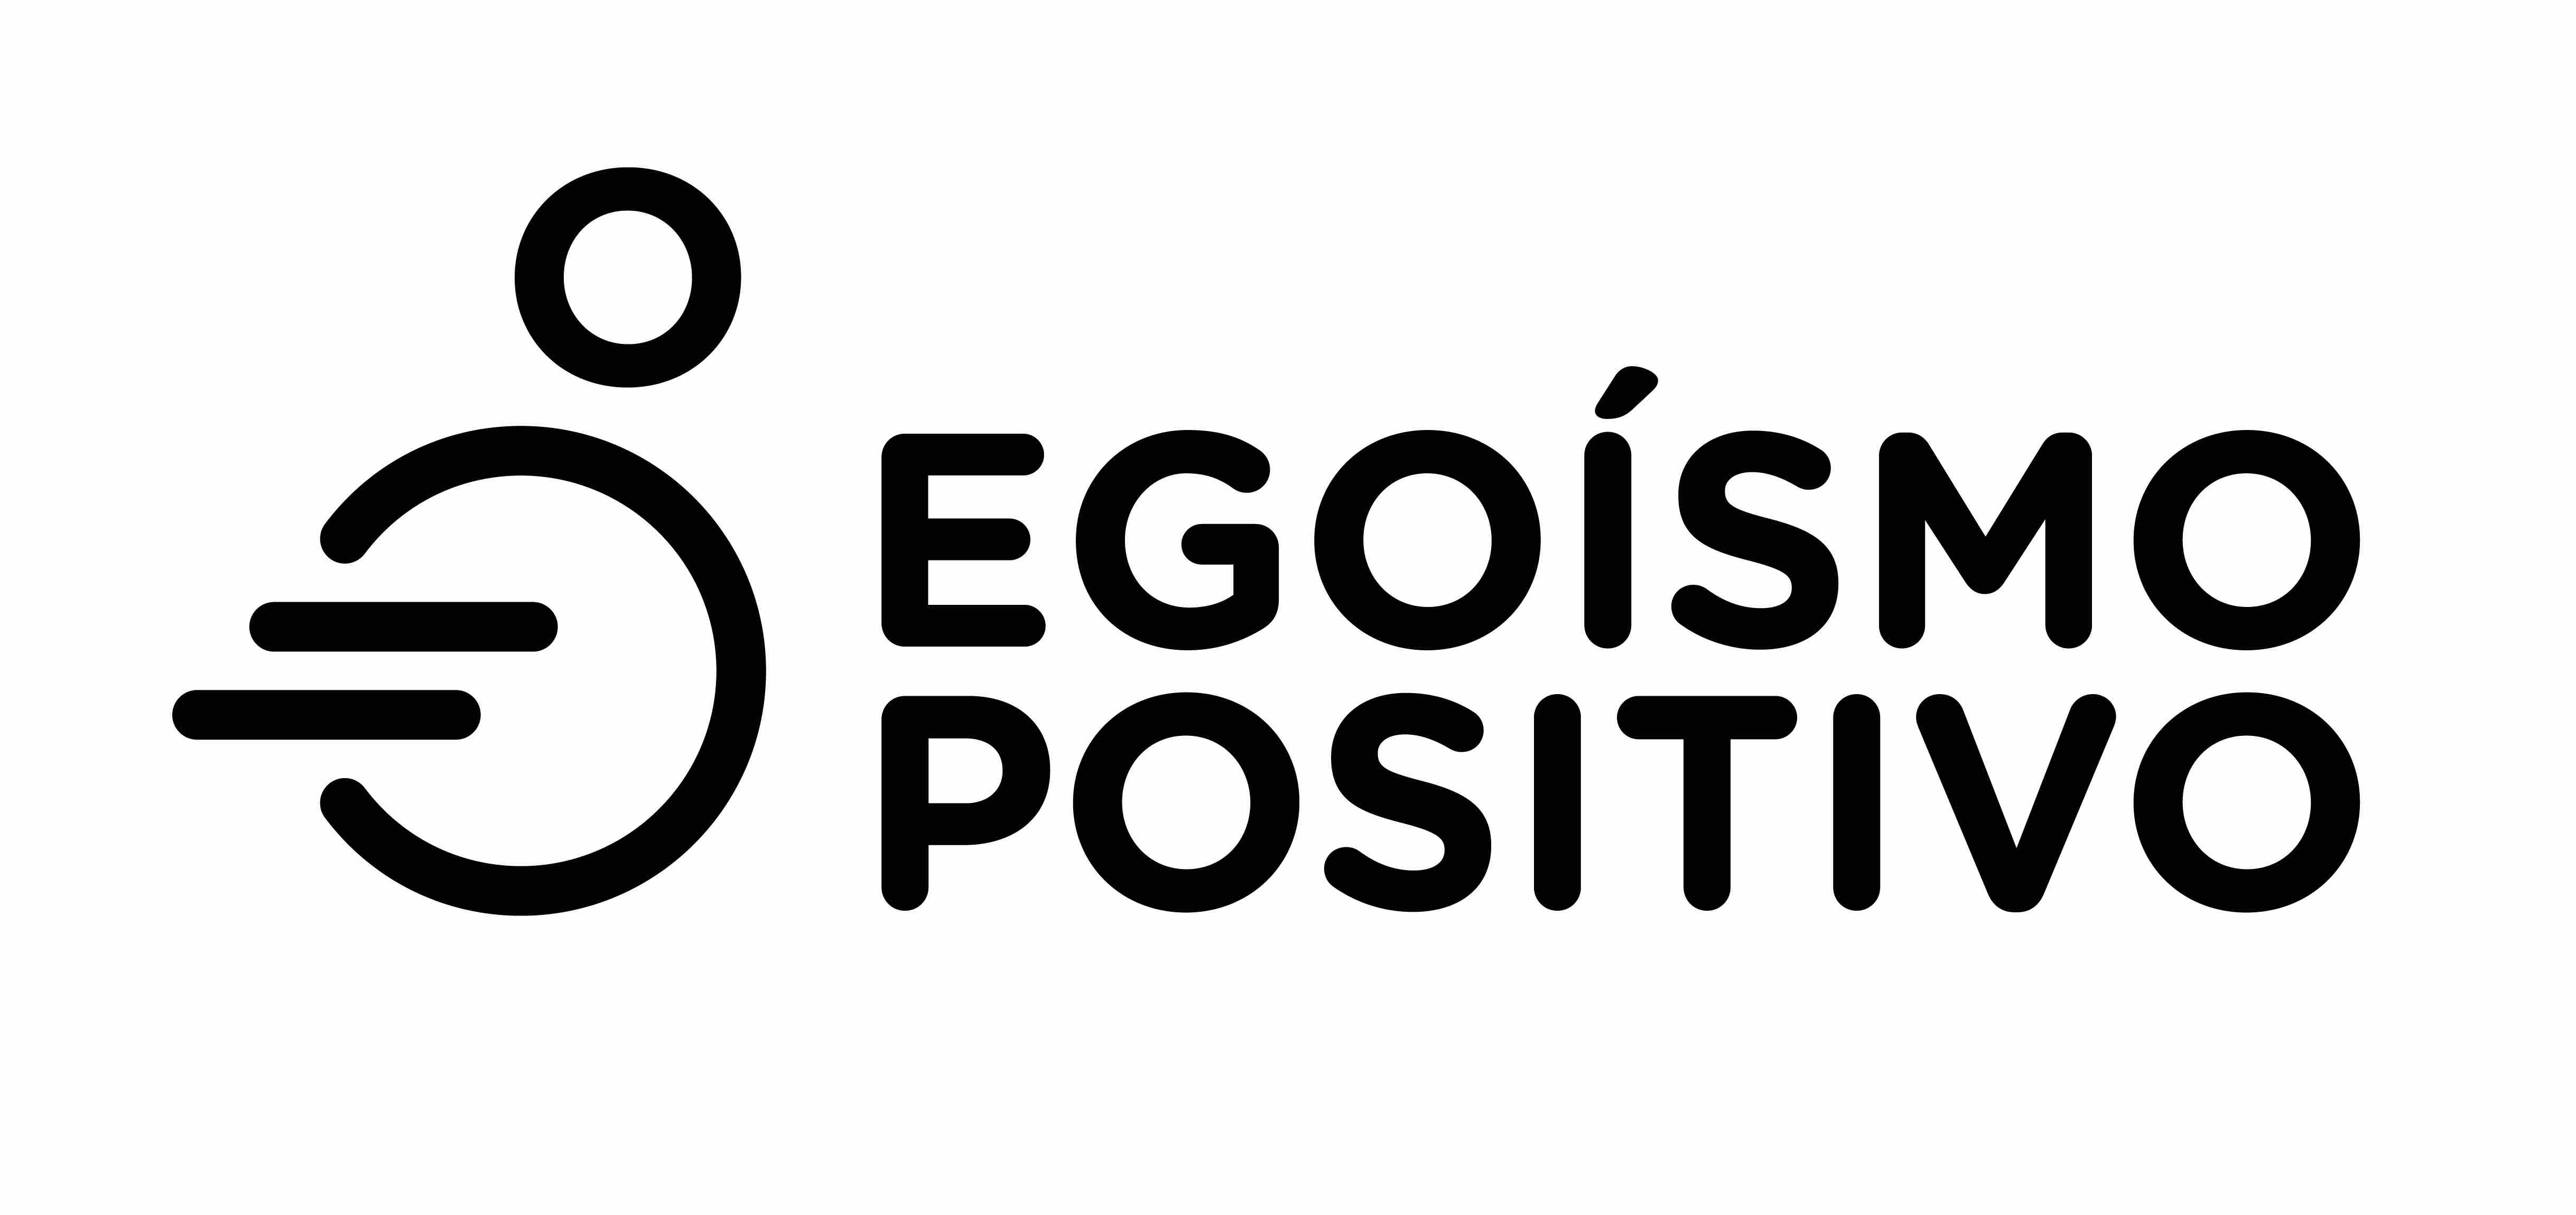 Egoísmo positivo